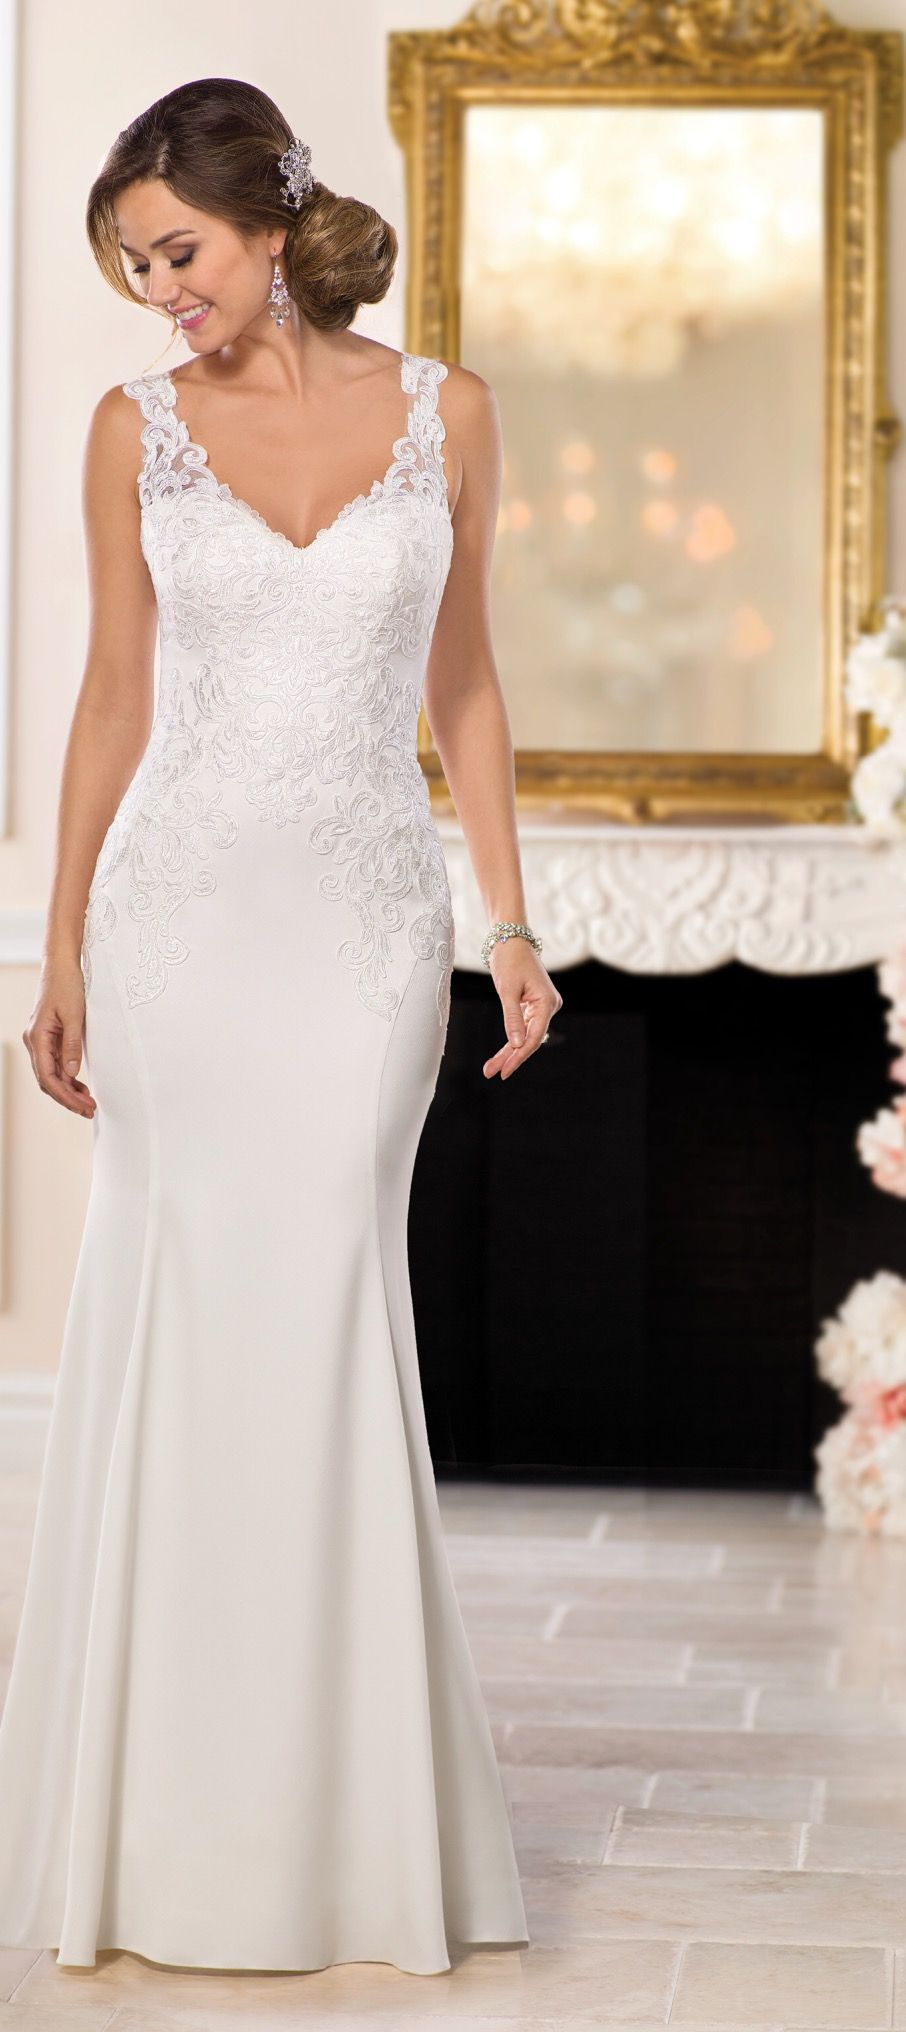 cecc7cdf75c Available   Low s Bridal. STELLA YORK STYLE 6514. Available   Low s Bridal.  Casual Lace Wedding Dress ...